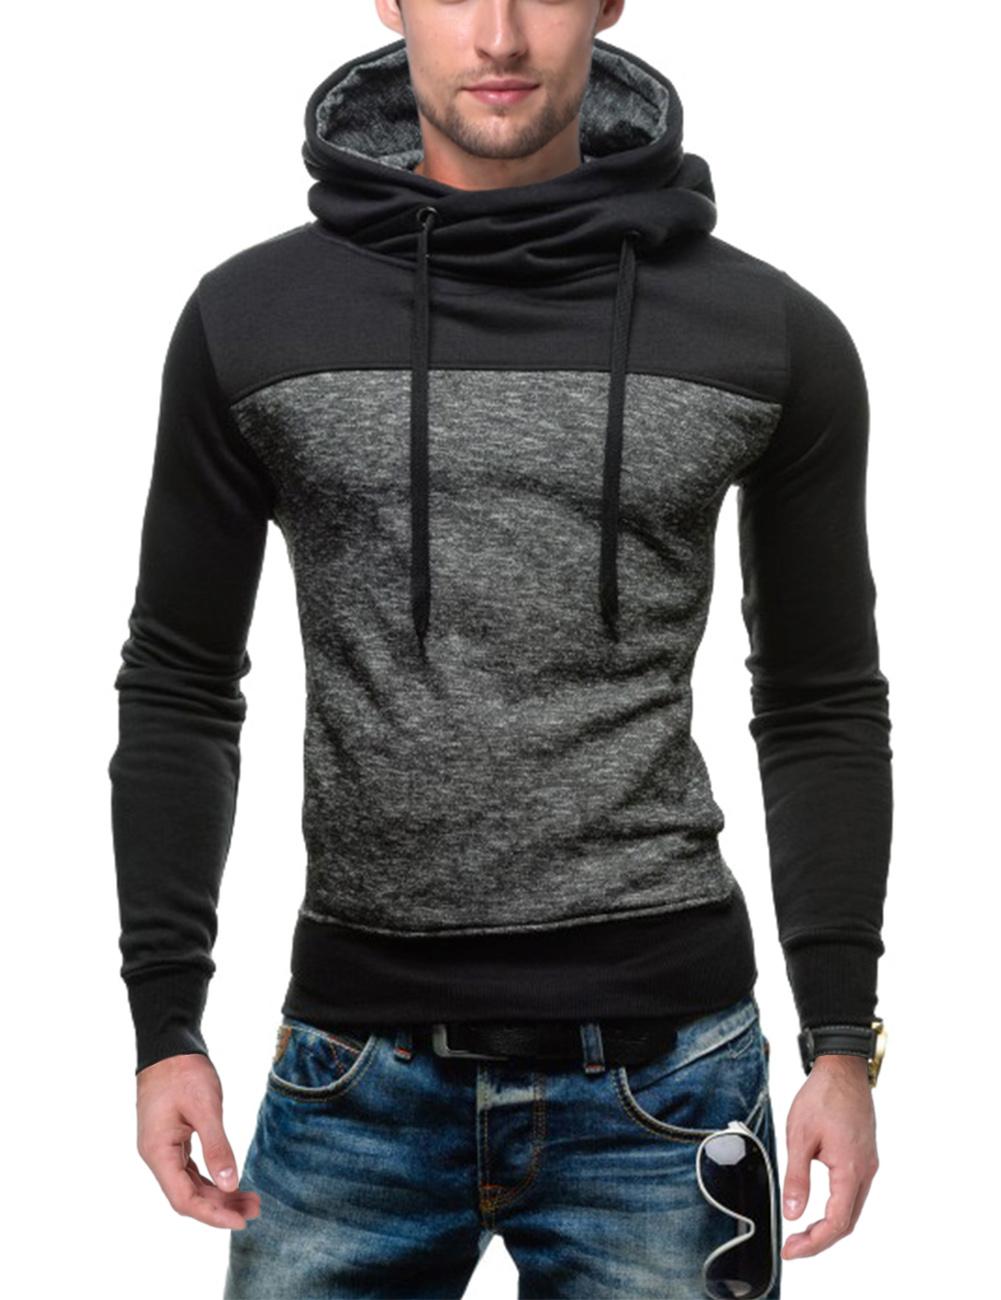 Men's Fashion Slim Colorblock Hoodies Sweatshirt Grey M